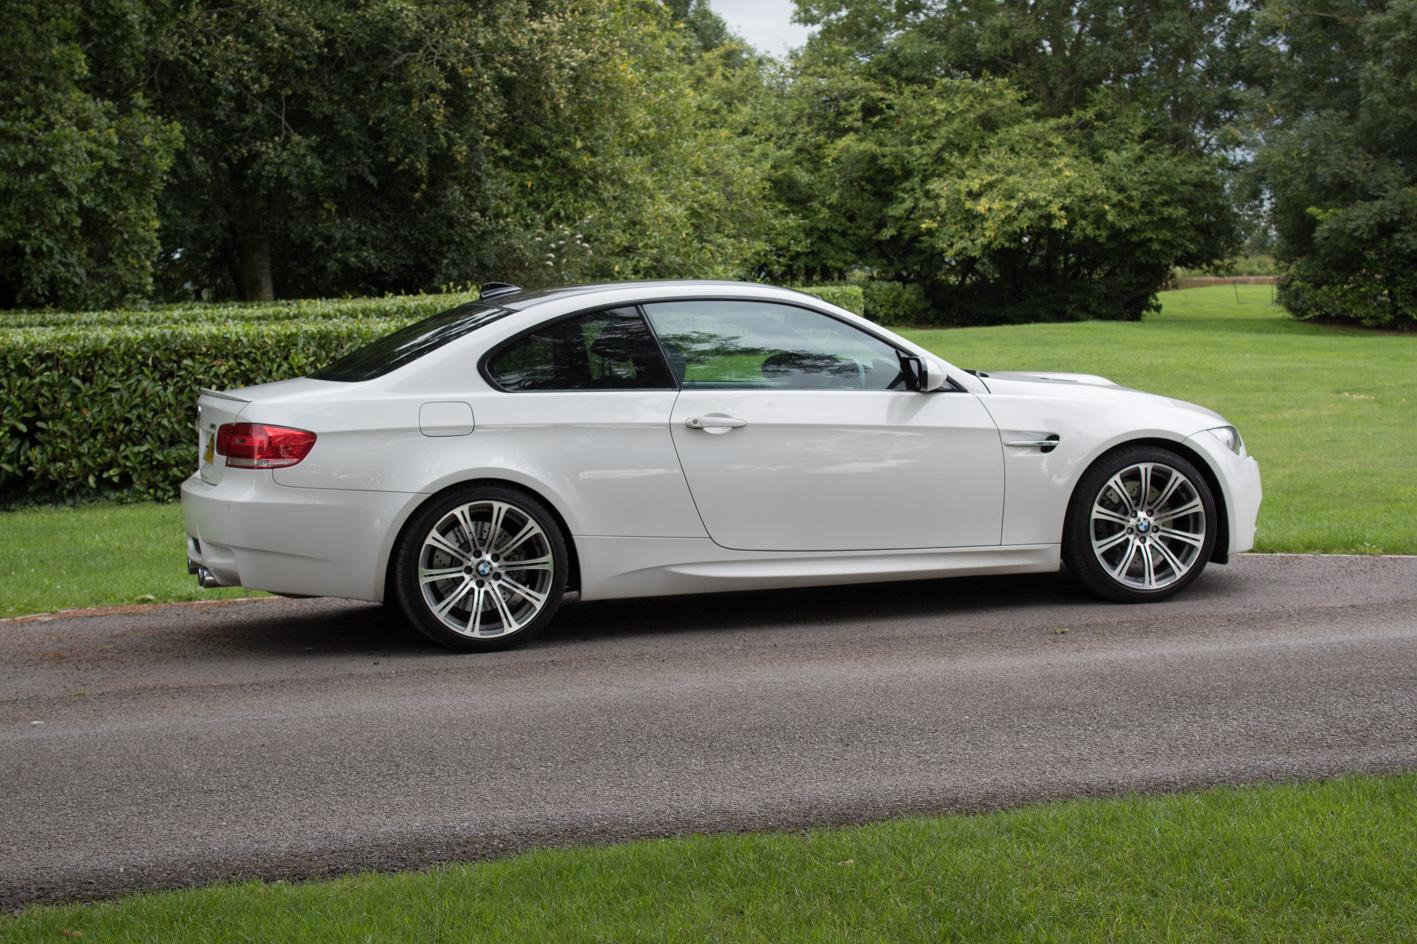 *SOLD* 2007 BMW M3 White E92 V8 - Cars of Somerset